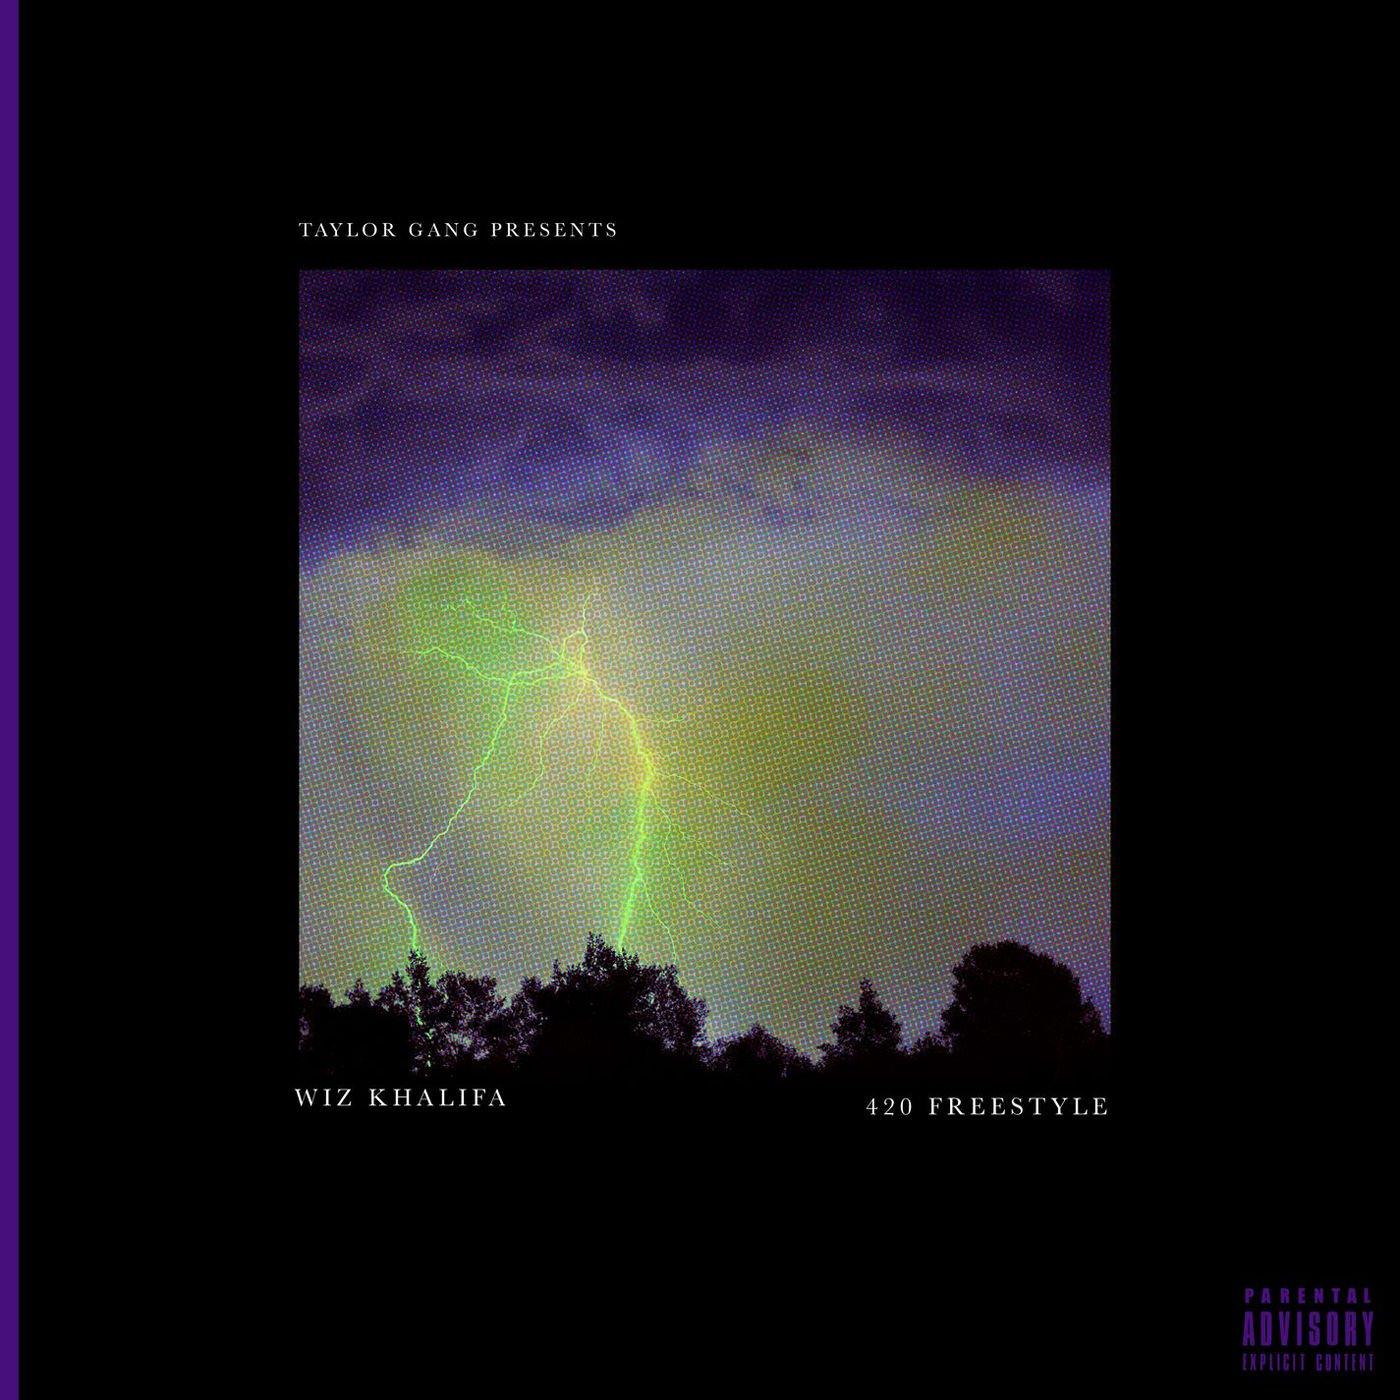 "New music from @wizkhalifa x @MikeWiLLMadeIt!  Listen to '420 Freestyle"" ���� https://t.co/X4qjl8Zhc2 https://t.co/hRla5ijaZ5"